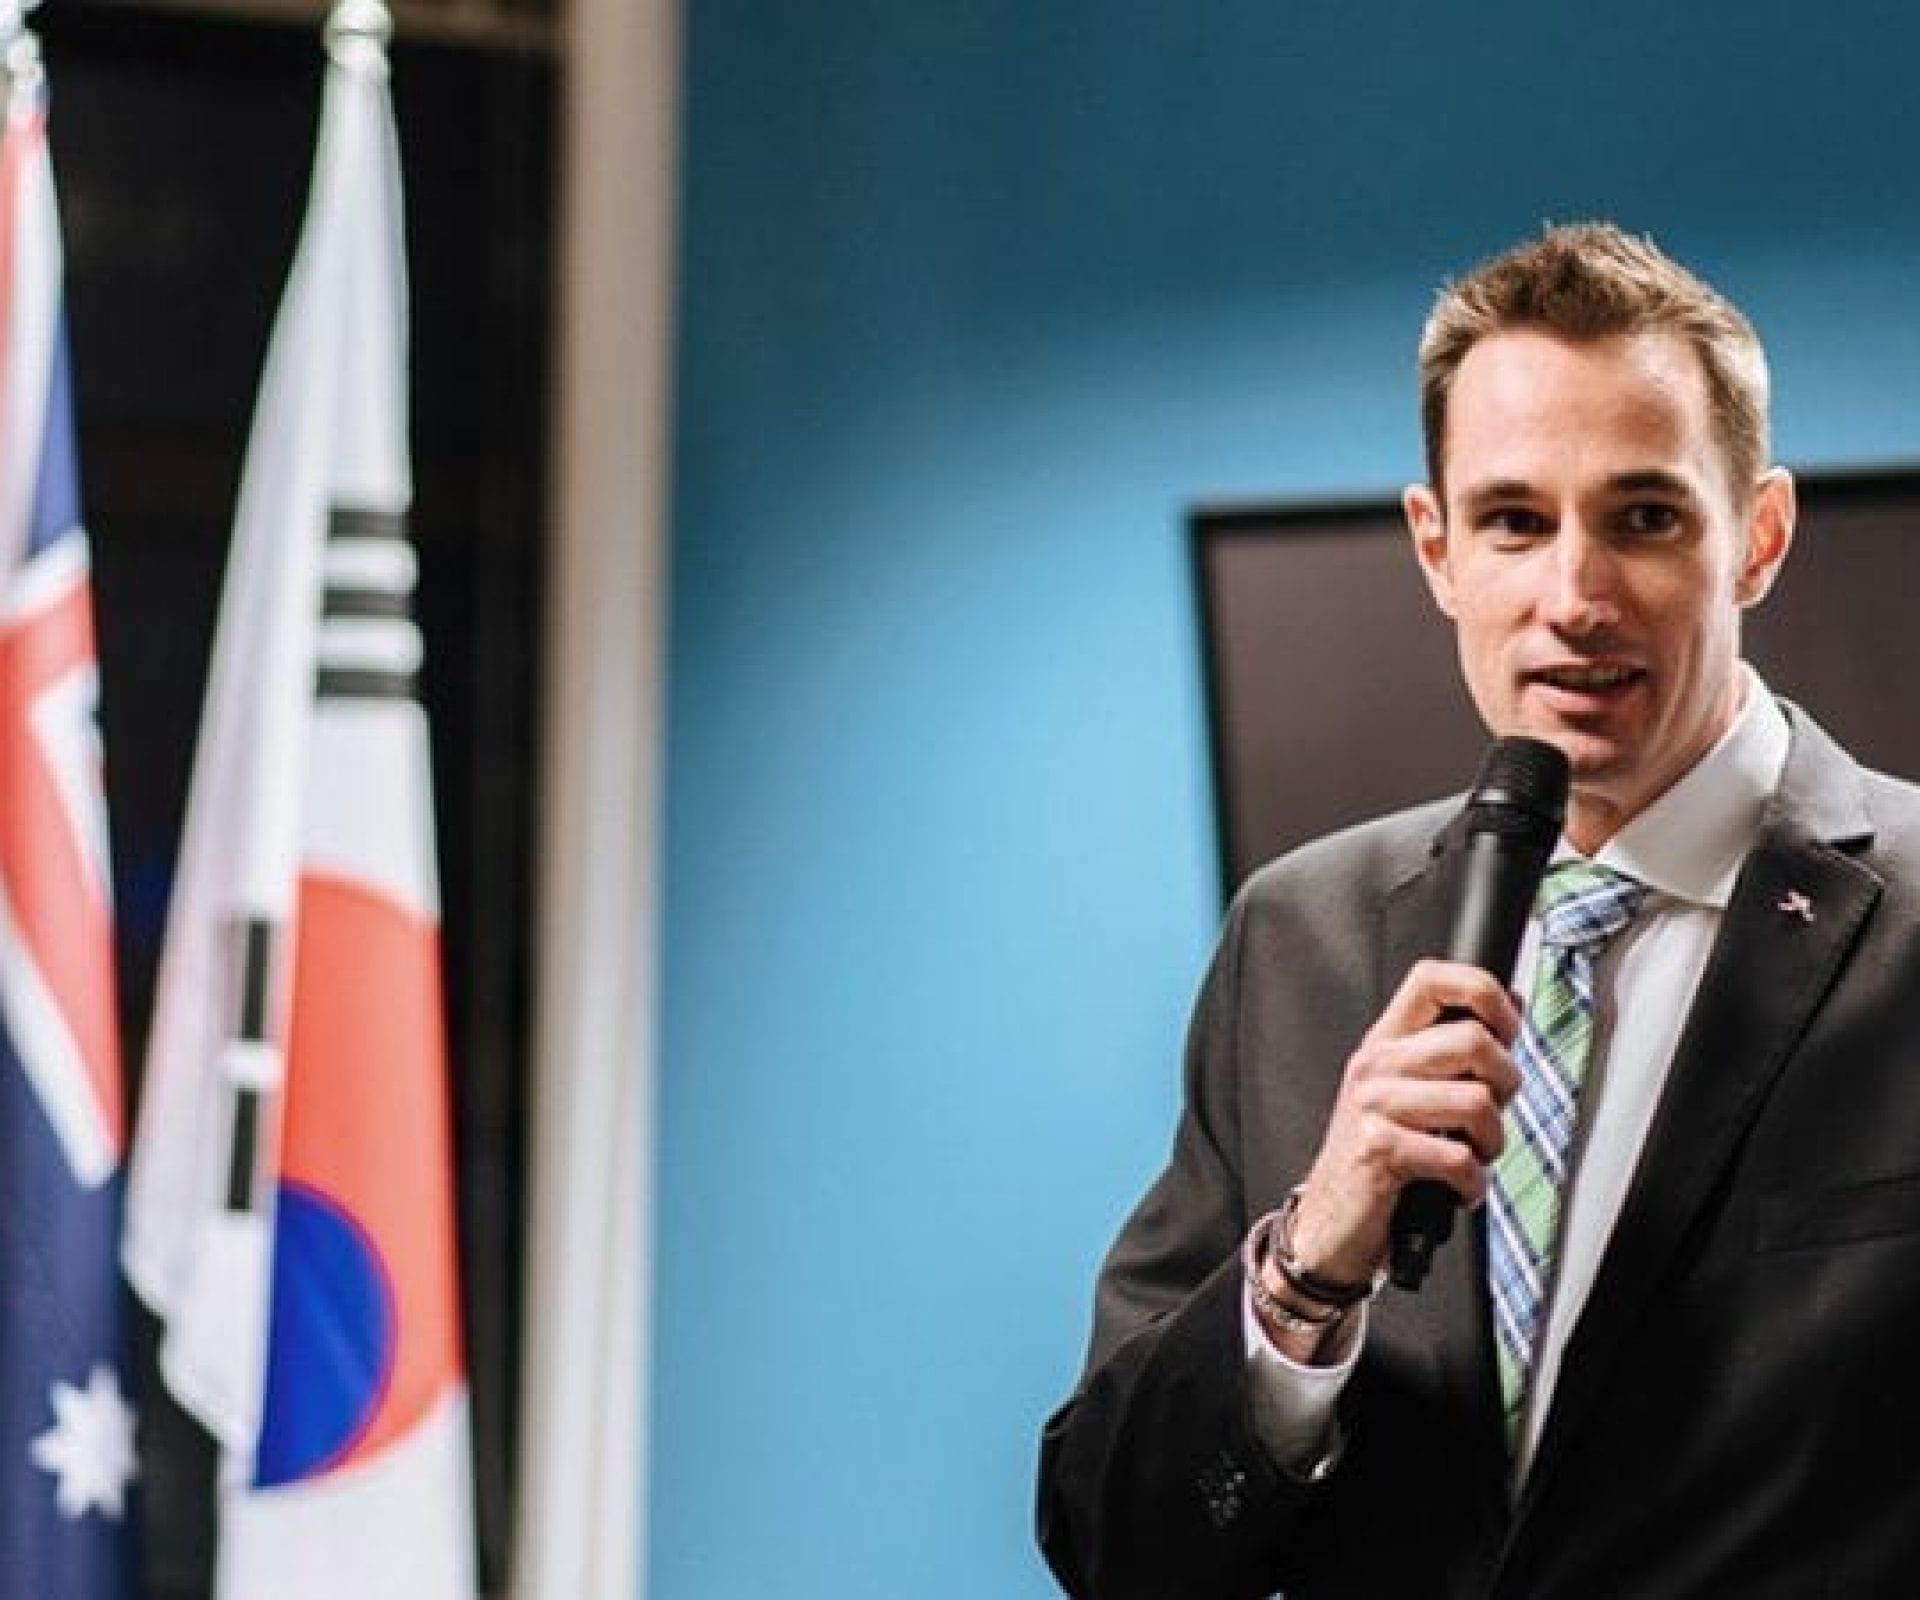 Australian Chamber Of Commerce In Korea | AUSTCHAM Korea